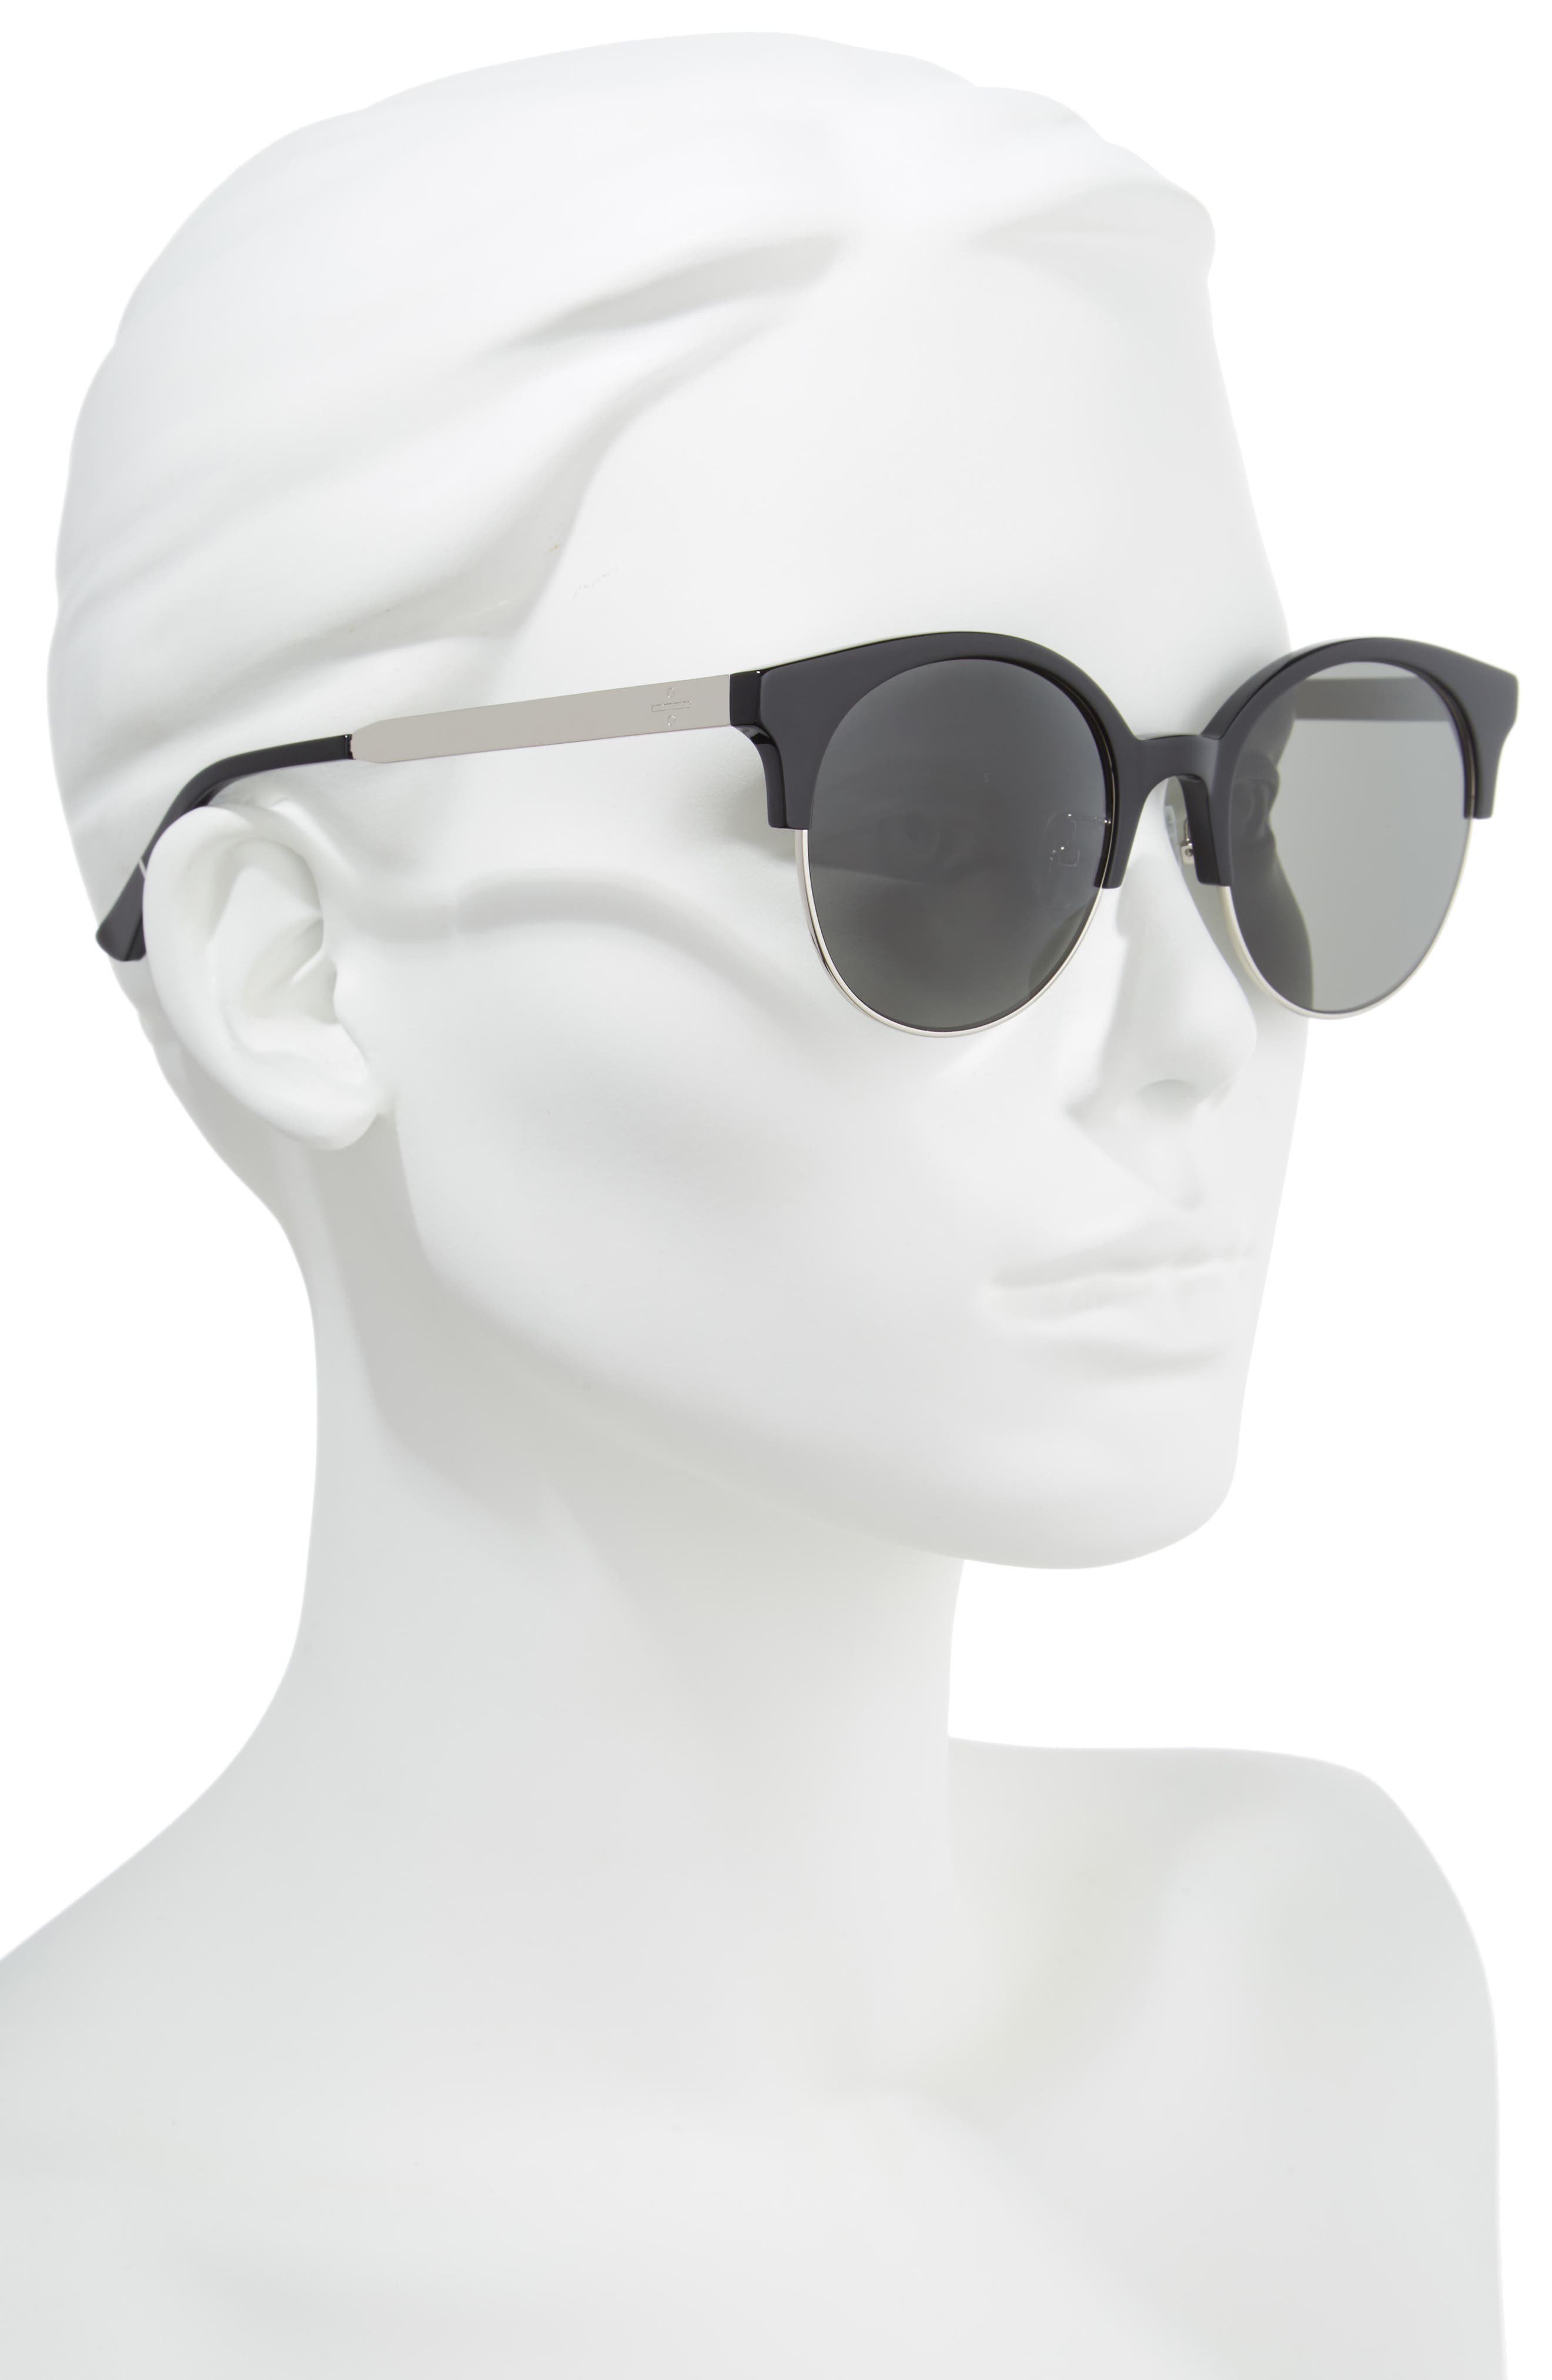 BLANC & ECLARE Venice Round Sunglasses,                             Alternate thumbnail 2, color,                             001